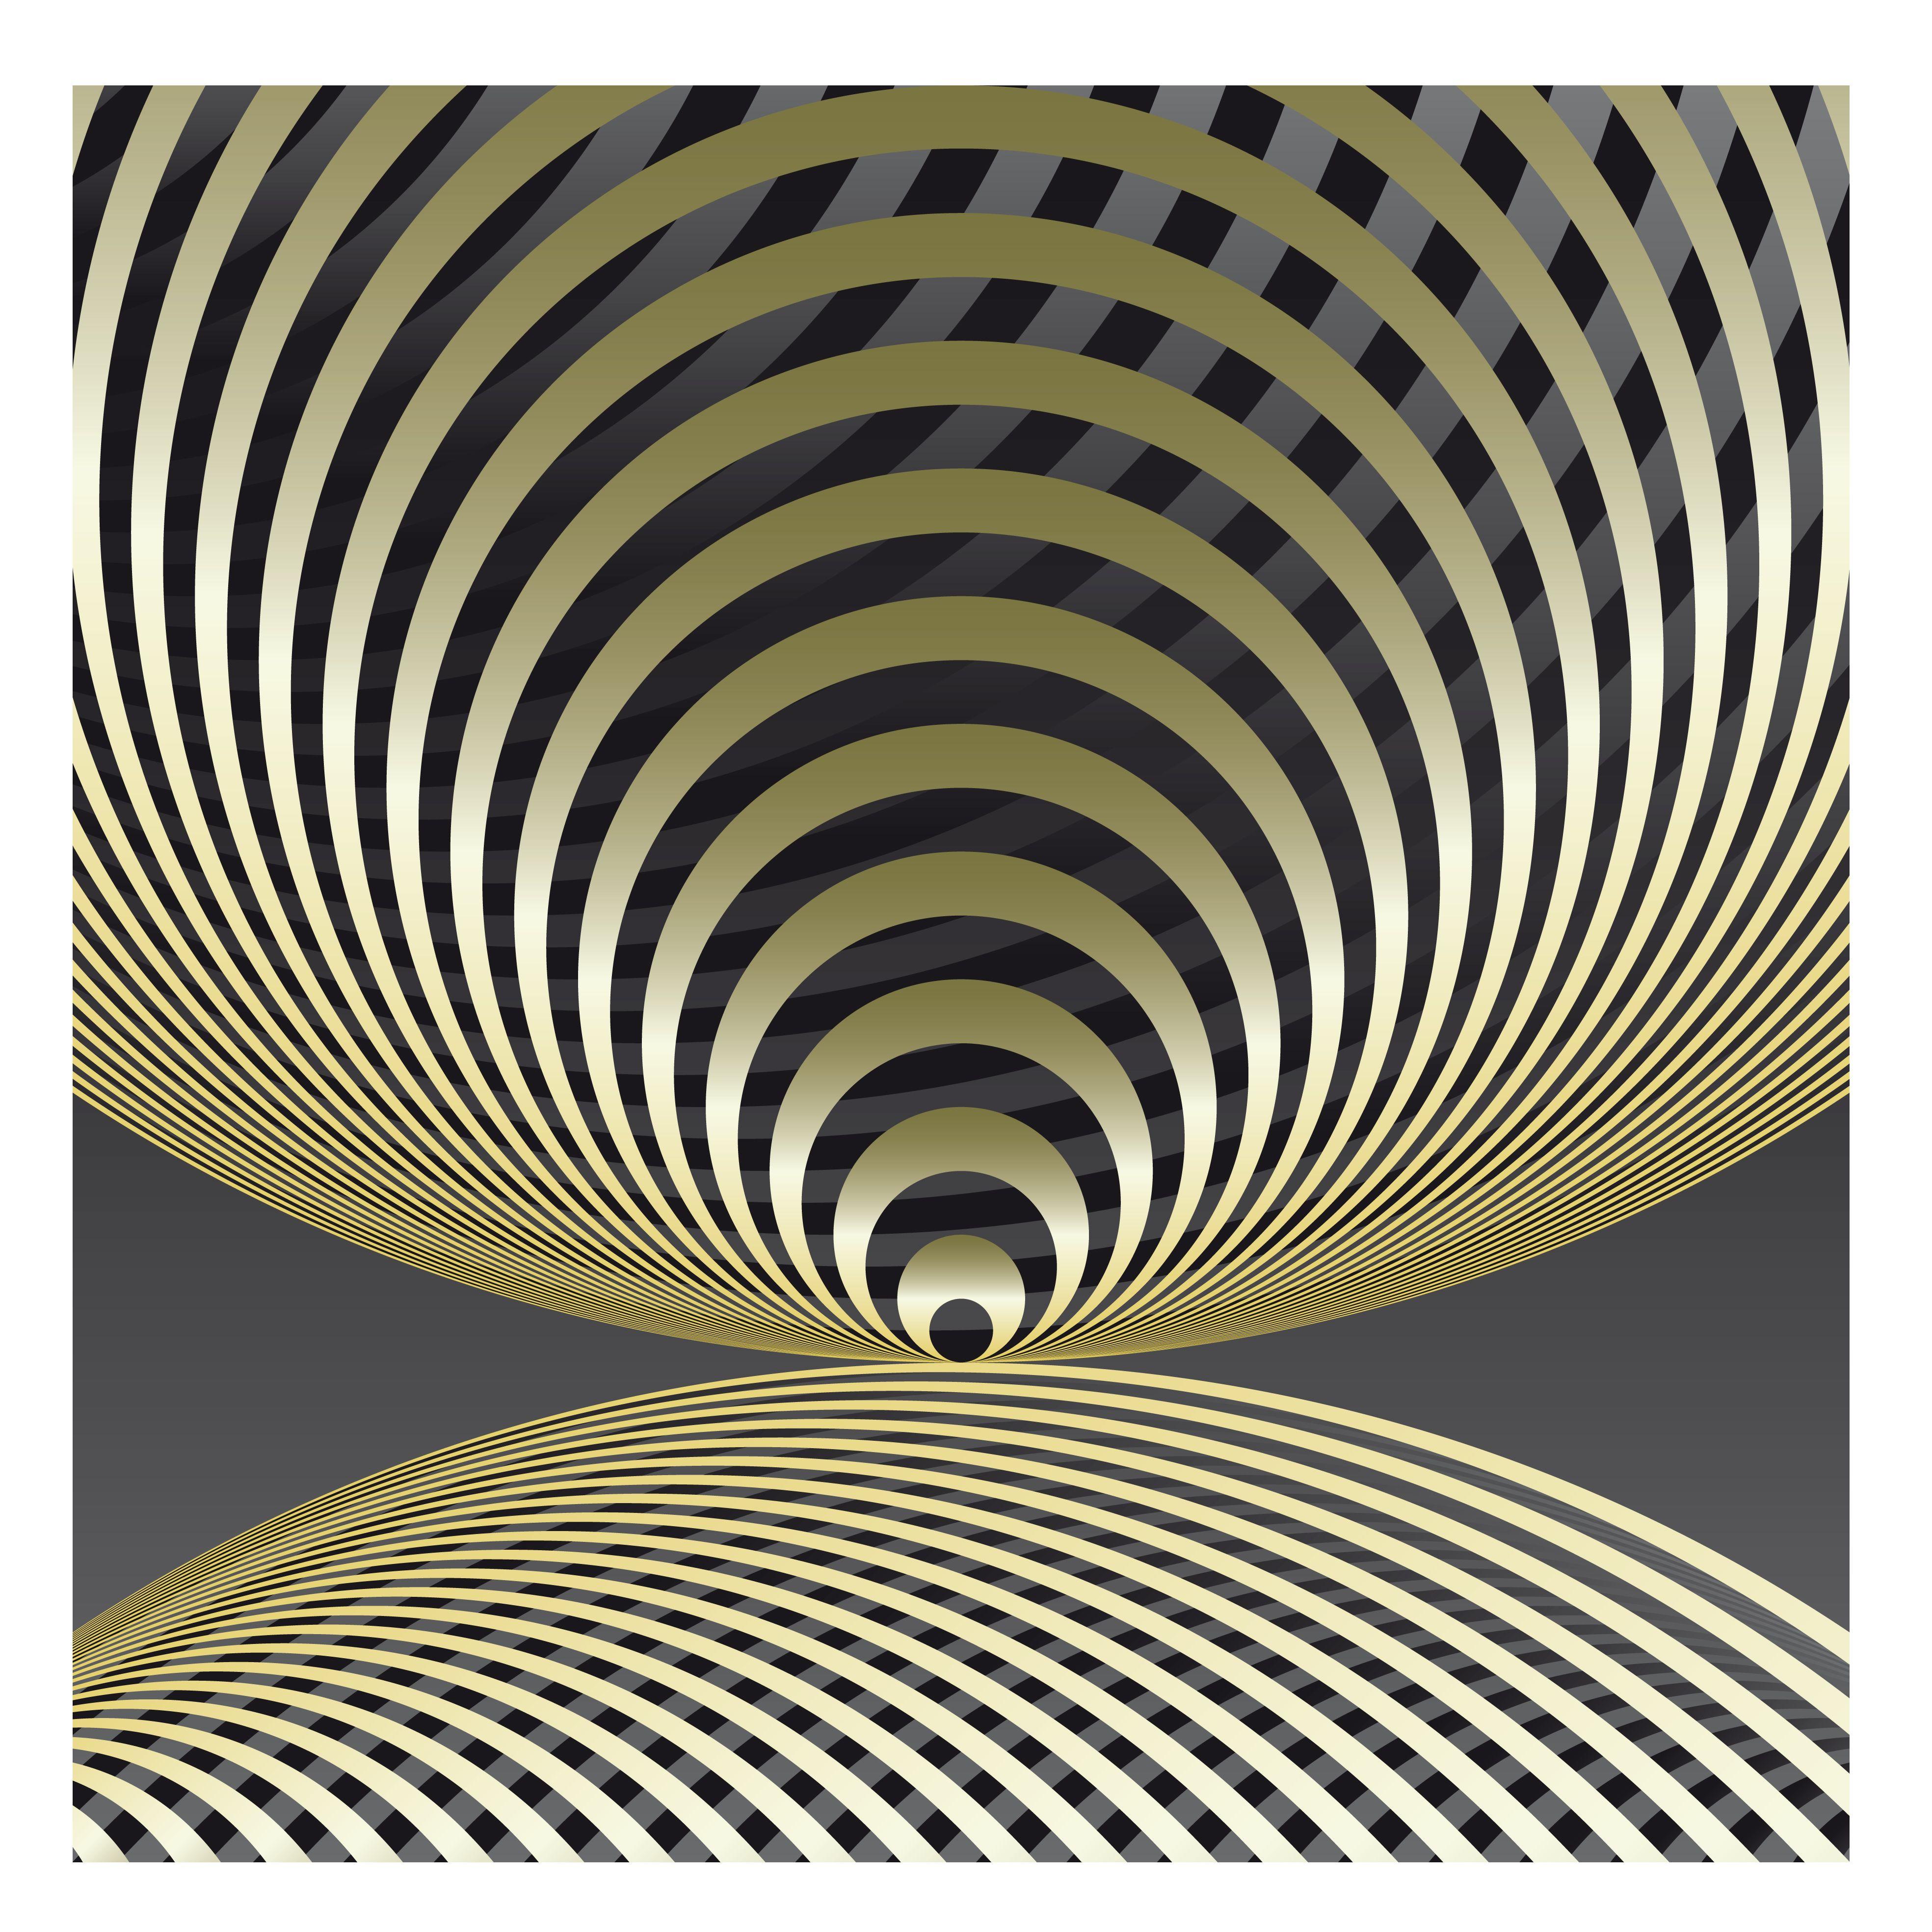 gold-diminishing-circles.jpg 3,937×3,937 pikseli